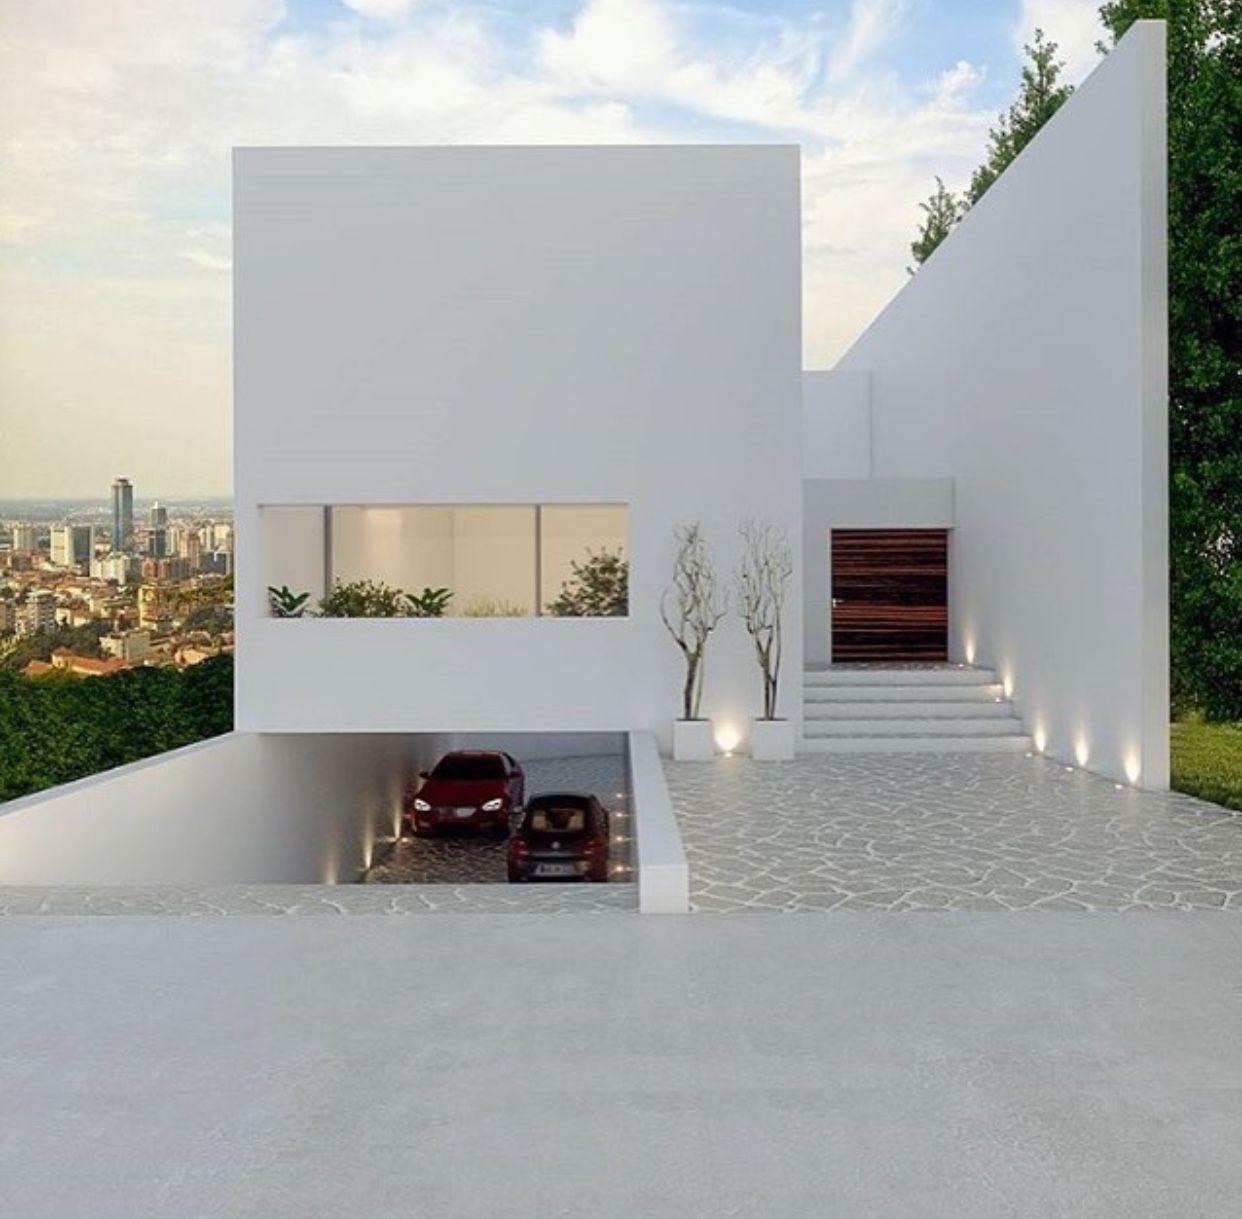 Pin von Tatsuhiro Yoshioka auf HOME   Pinterest   Architektur ...